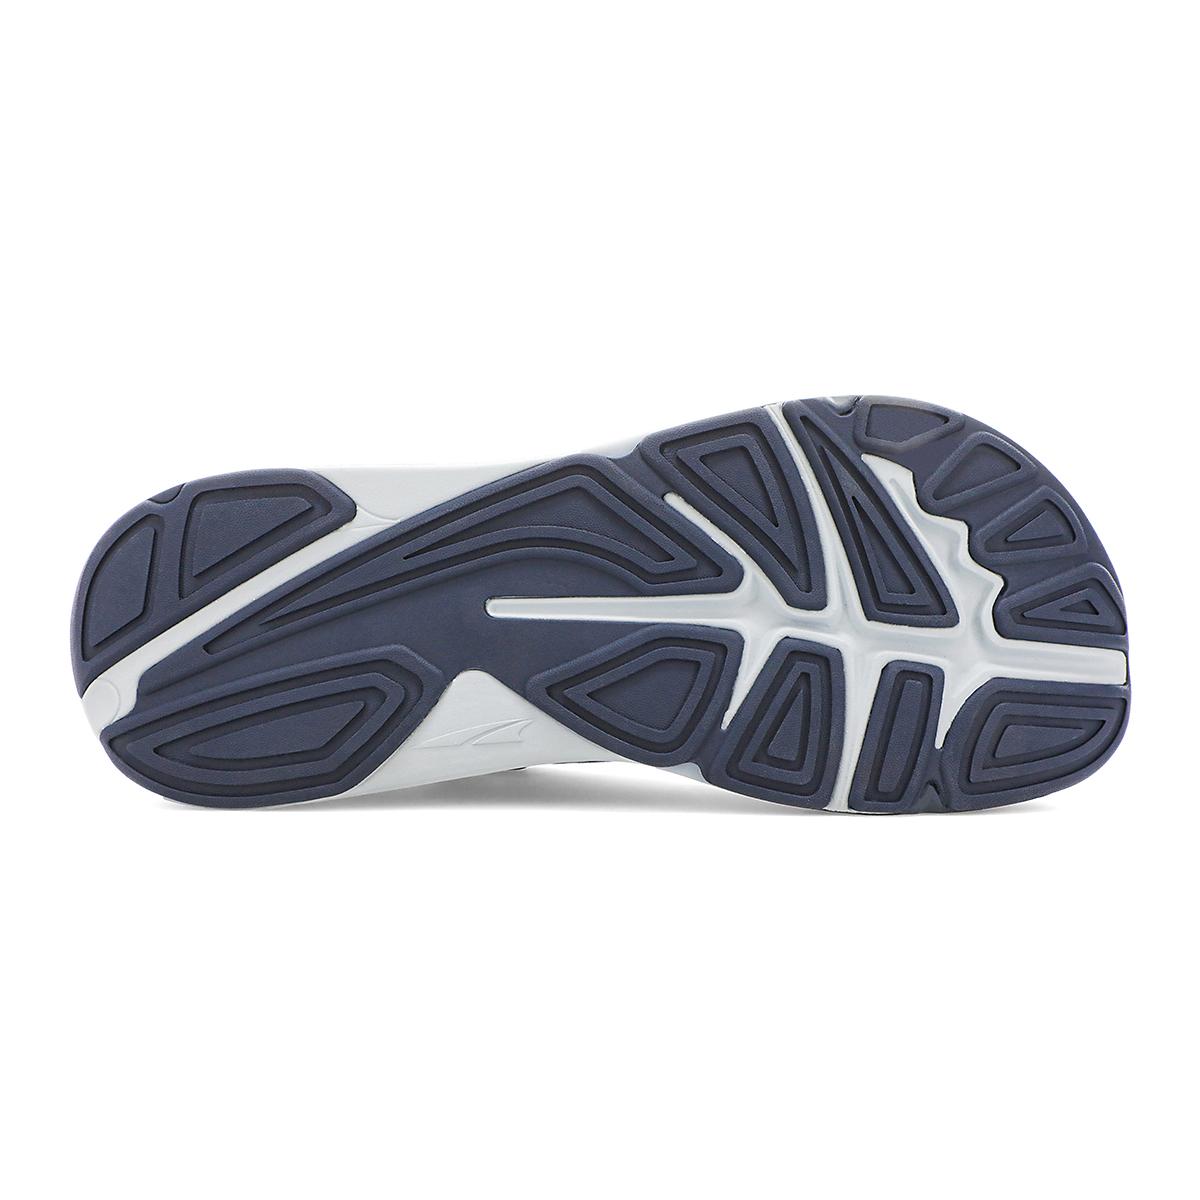 Men's Altra Paradigm 5 Running Shoe - Color: Dark Blue - Size: 7 - Width: Regular, Dark Blue, large, image 4